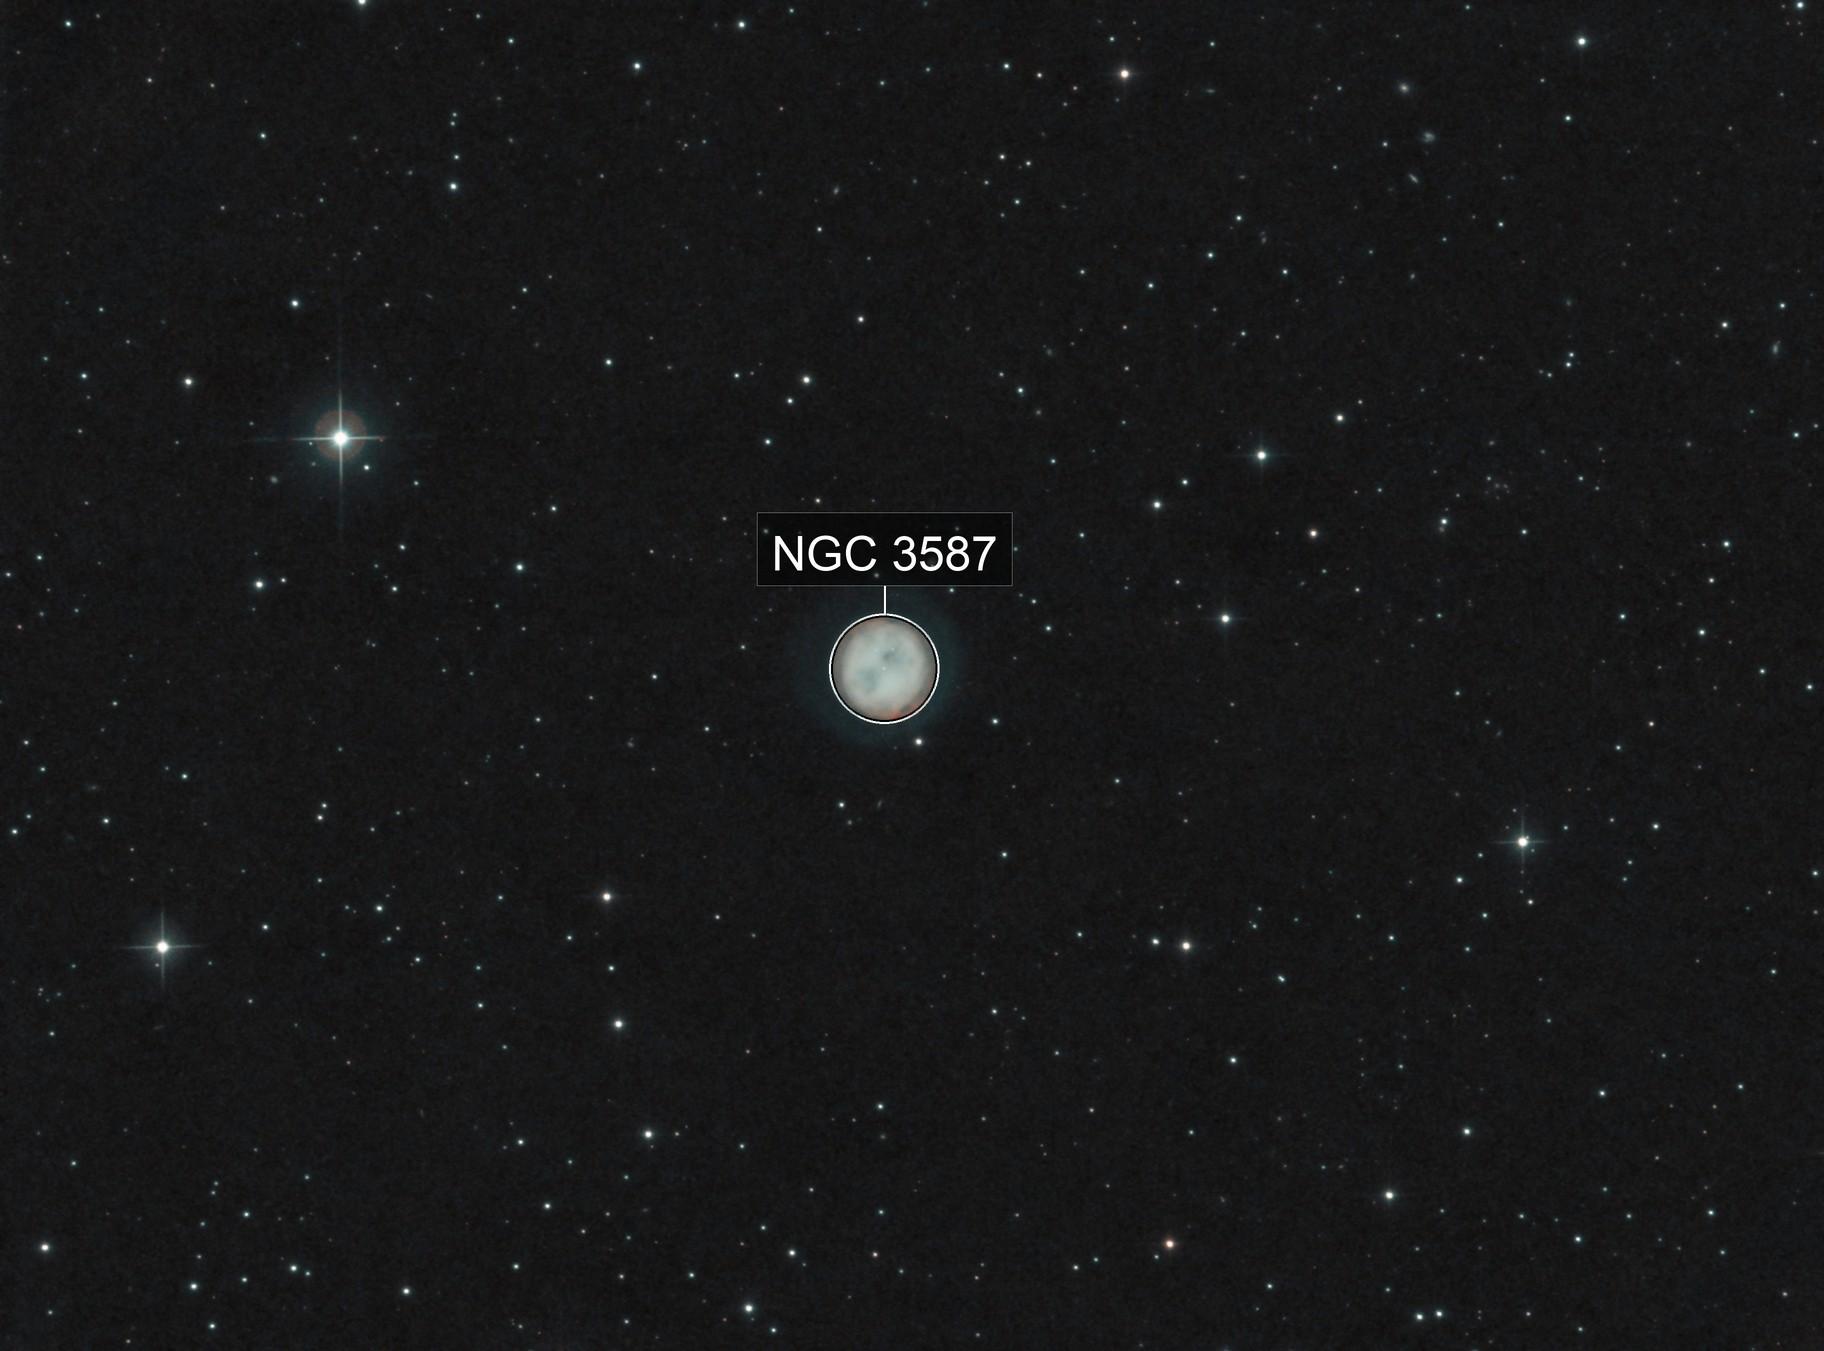 M097 2019 with faint OIII halo